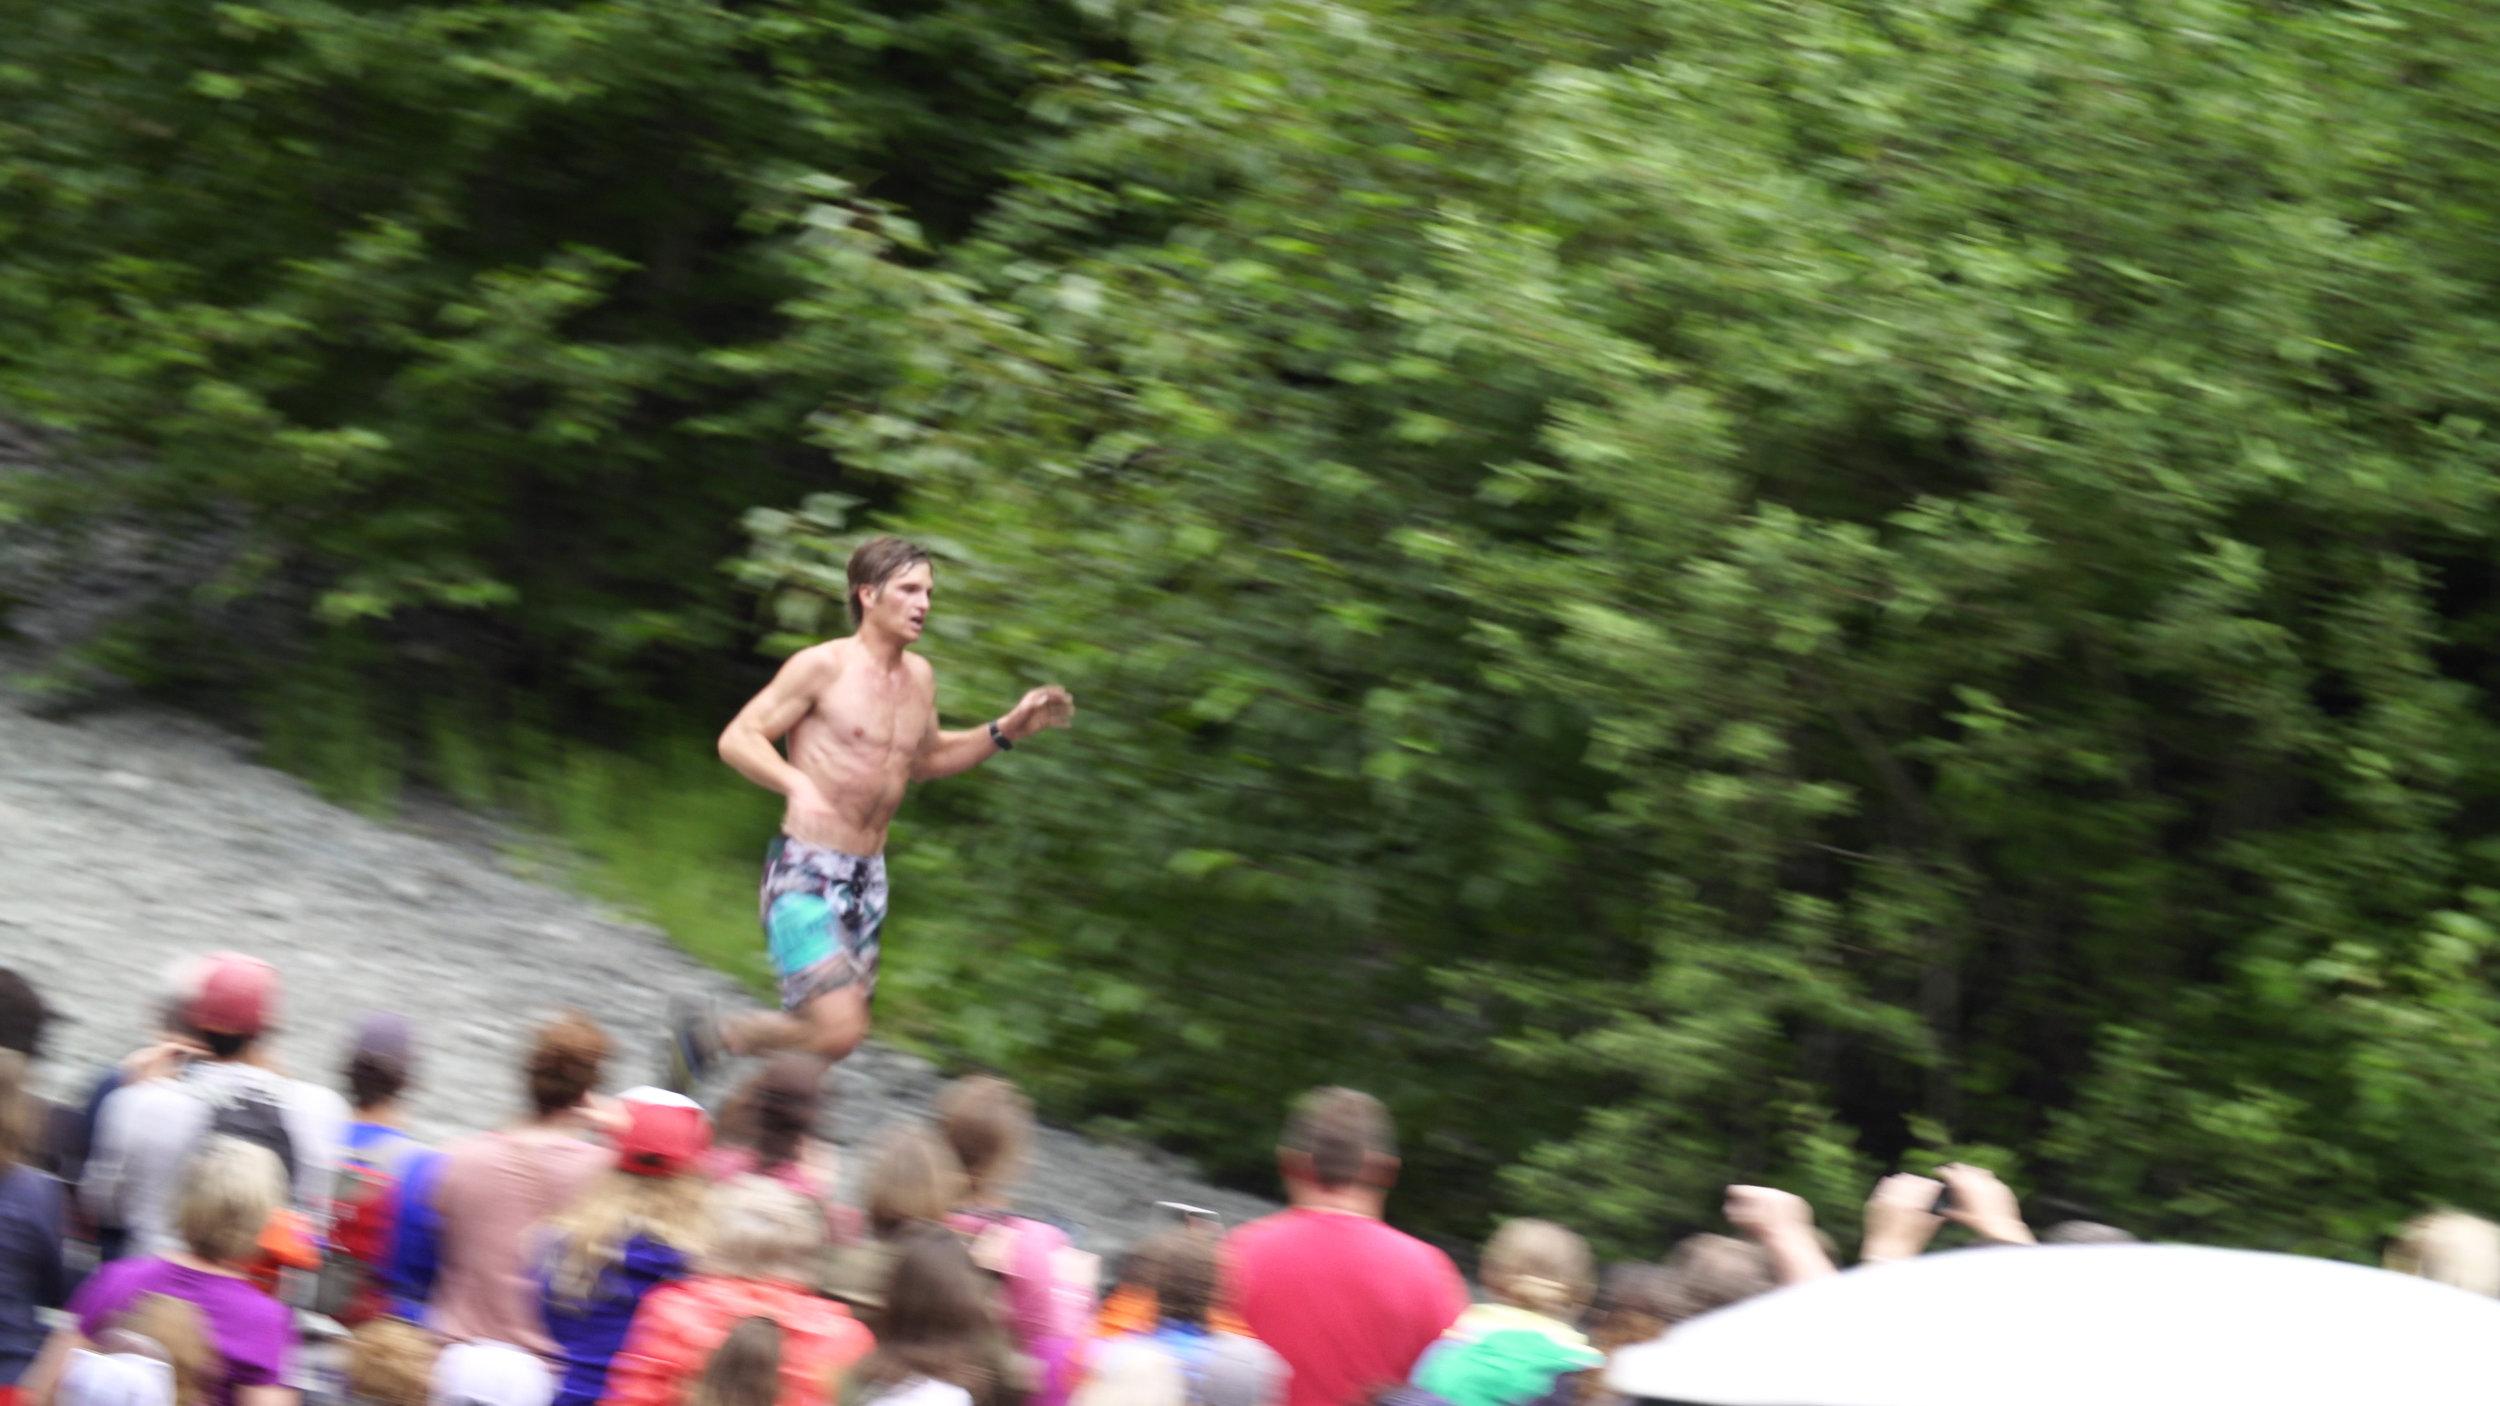 Coming off Mount Marathon- July 4th     Credit: Peakthree